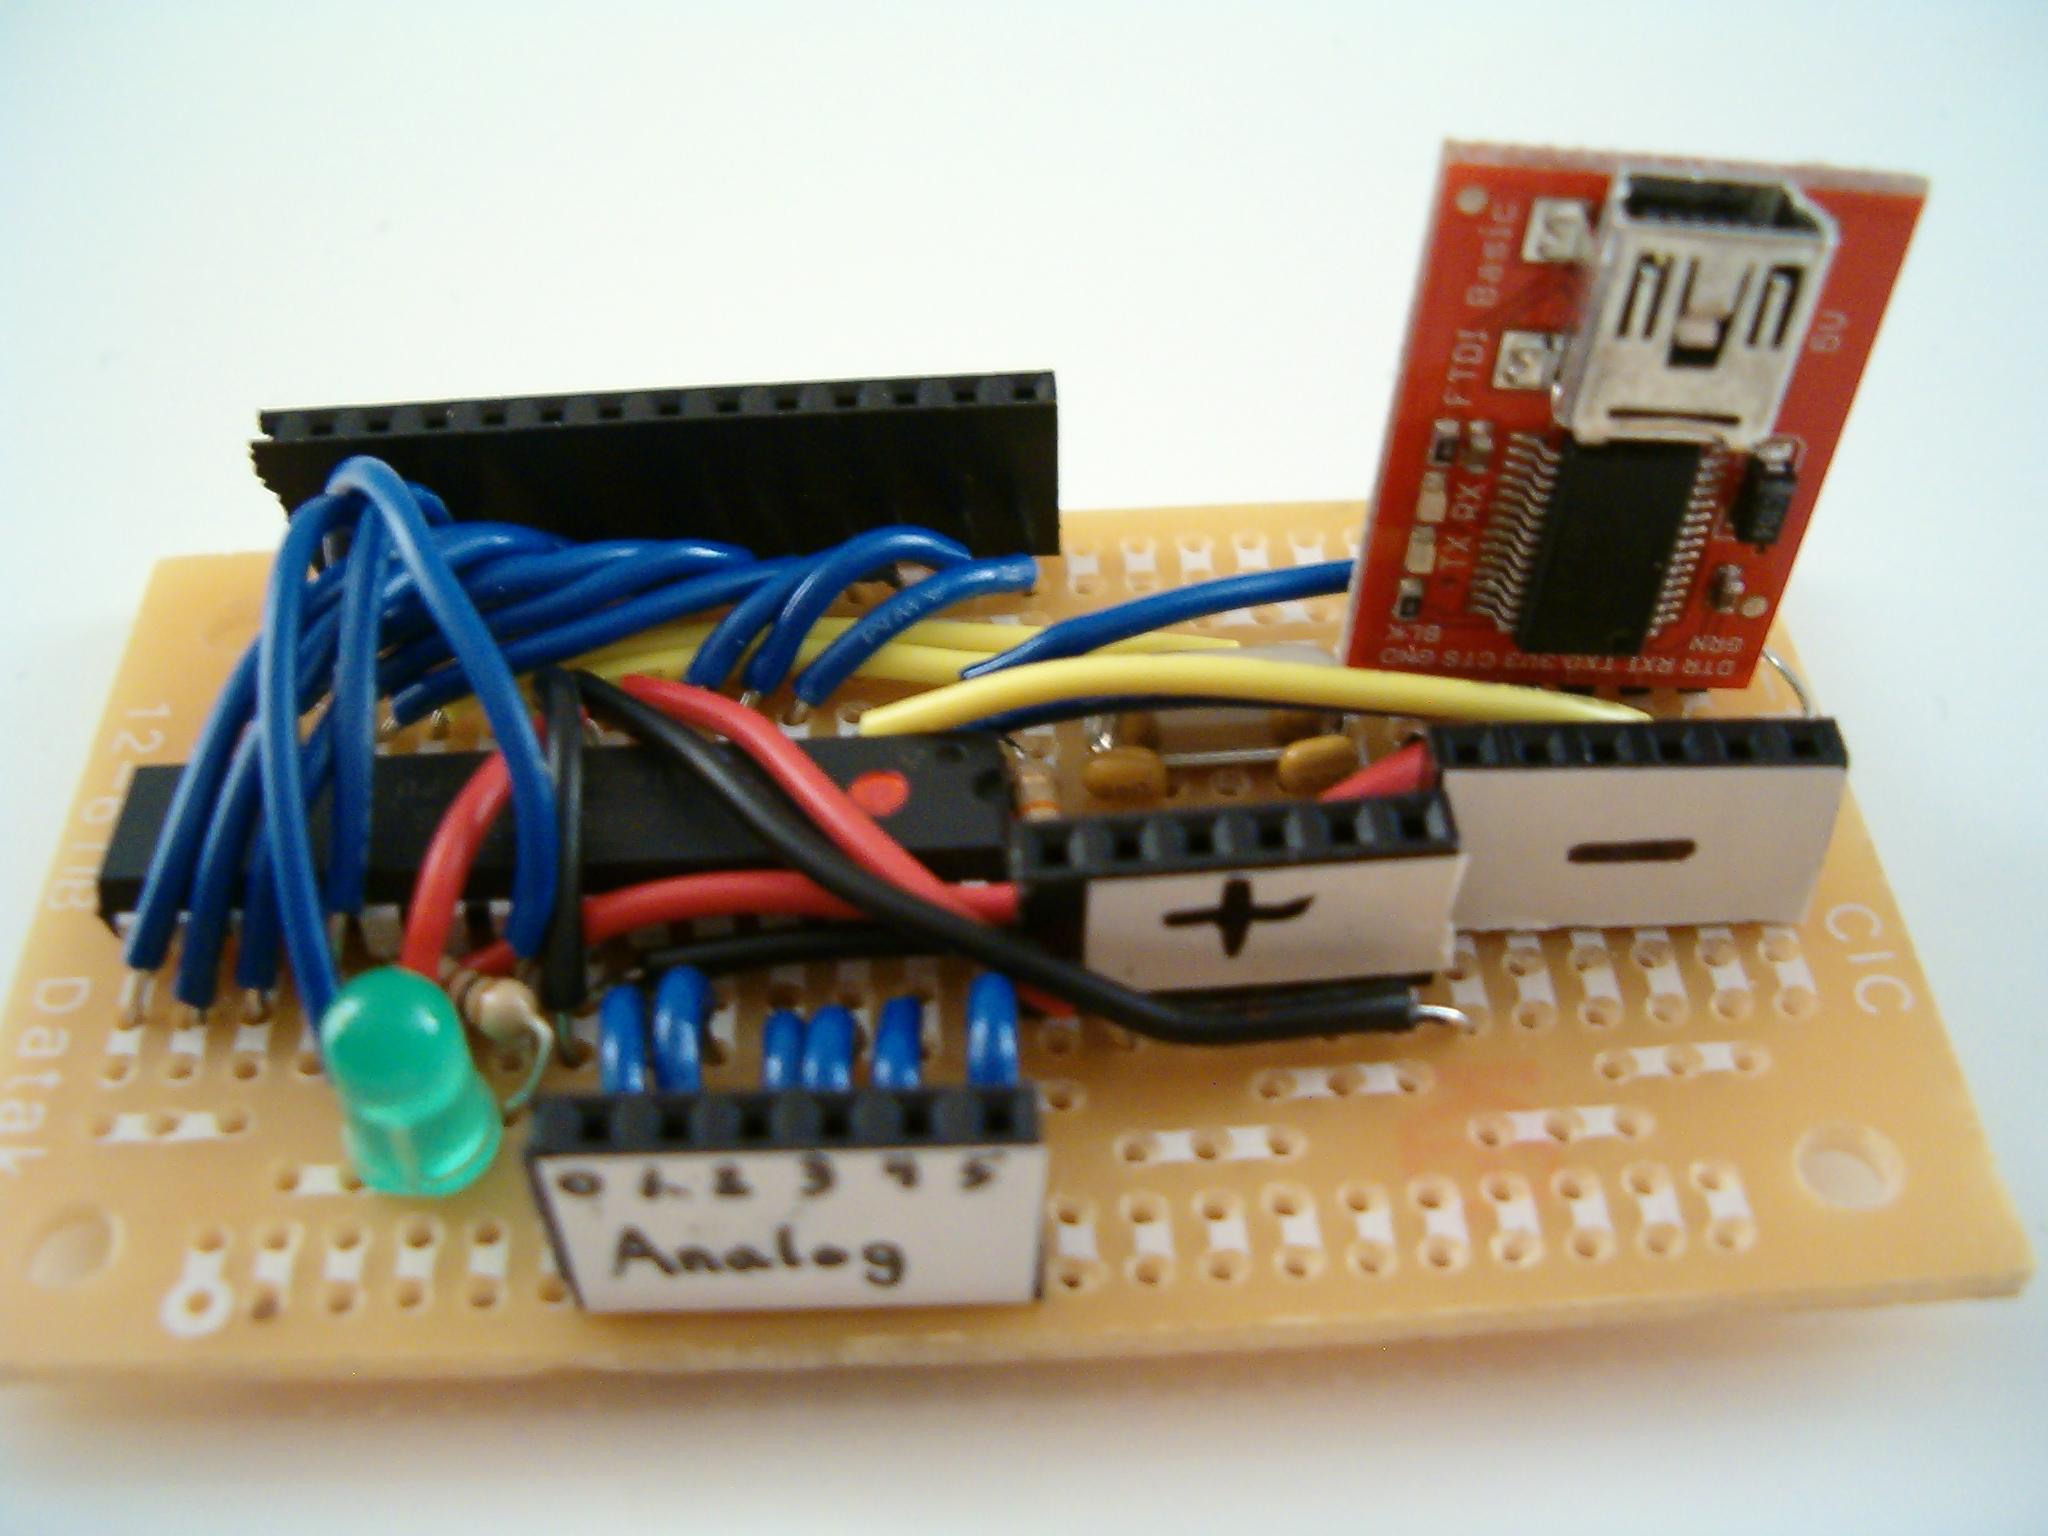 Perfduino Build Your Own Arduino